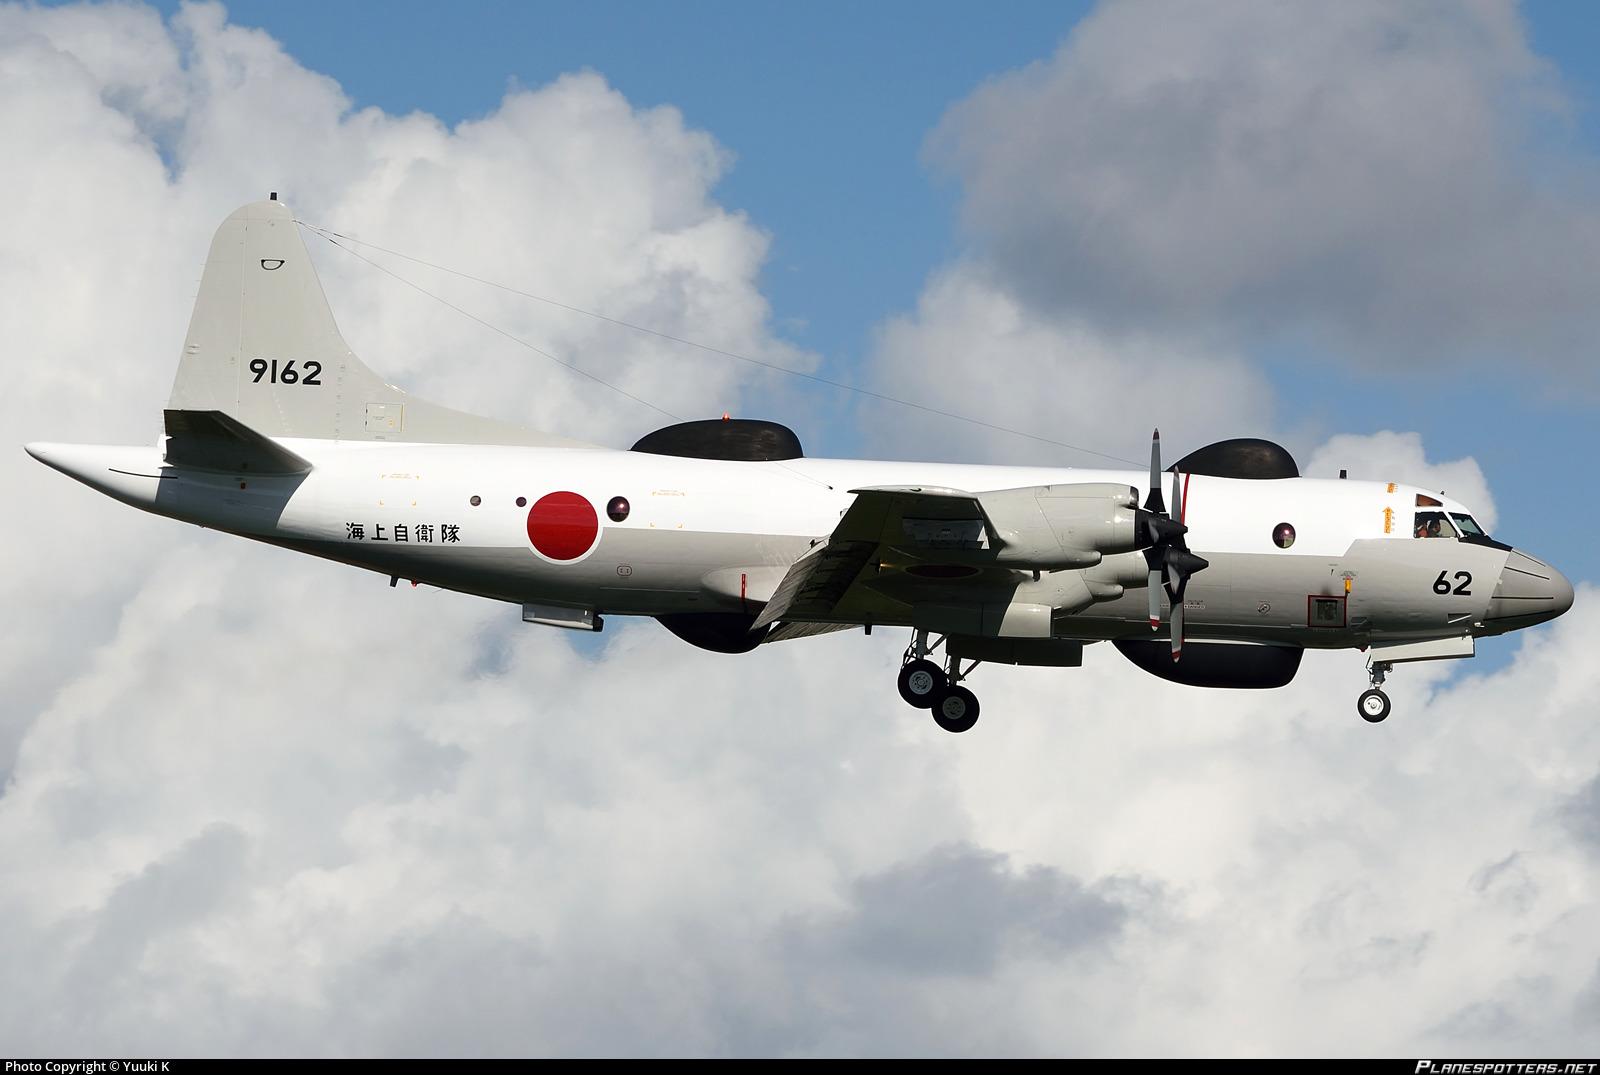 Brojimo u slikama - Page 7 9162-japan-maritime-self-defence-force-jmsdf-kawasaki-up-3d-orion_PlanespottersNet_717552_465977e2c8